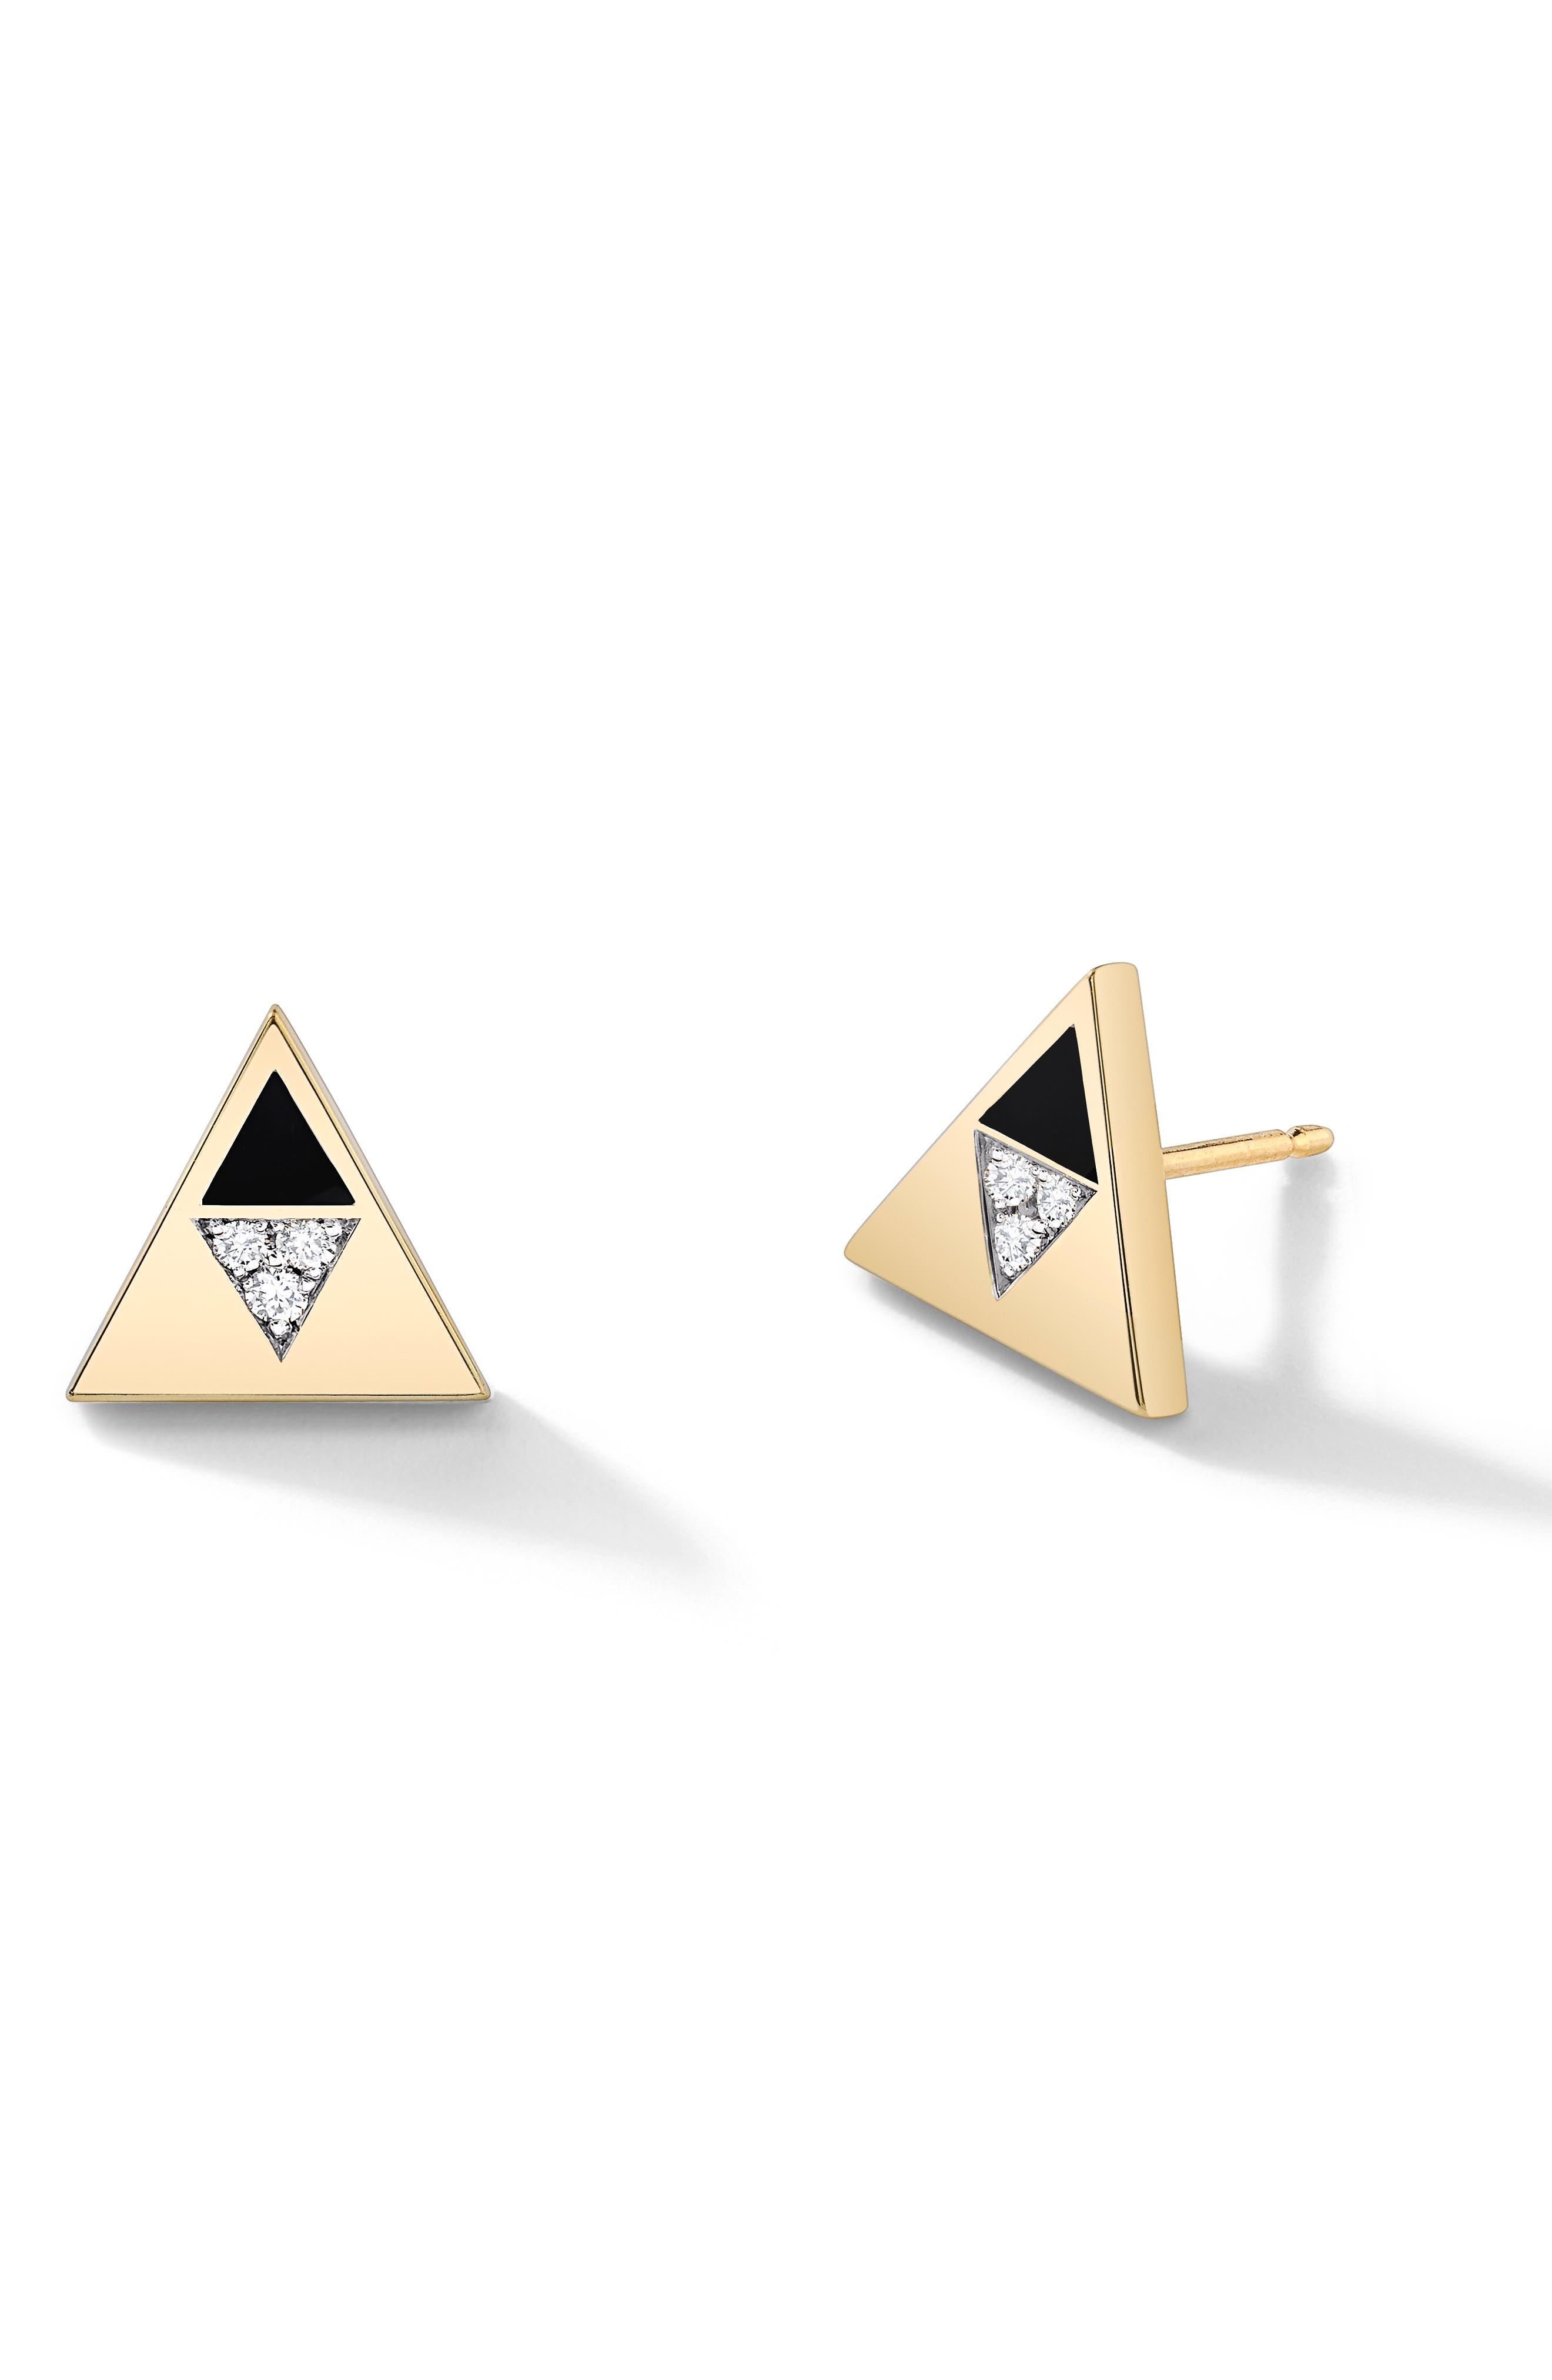 Articulated Stud Earrings